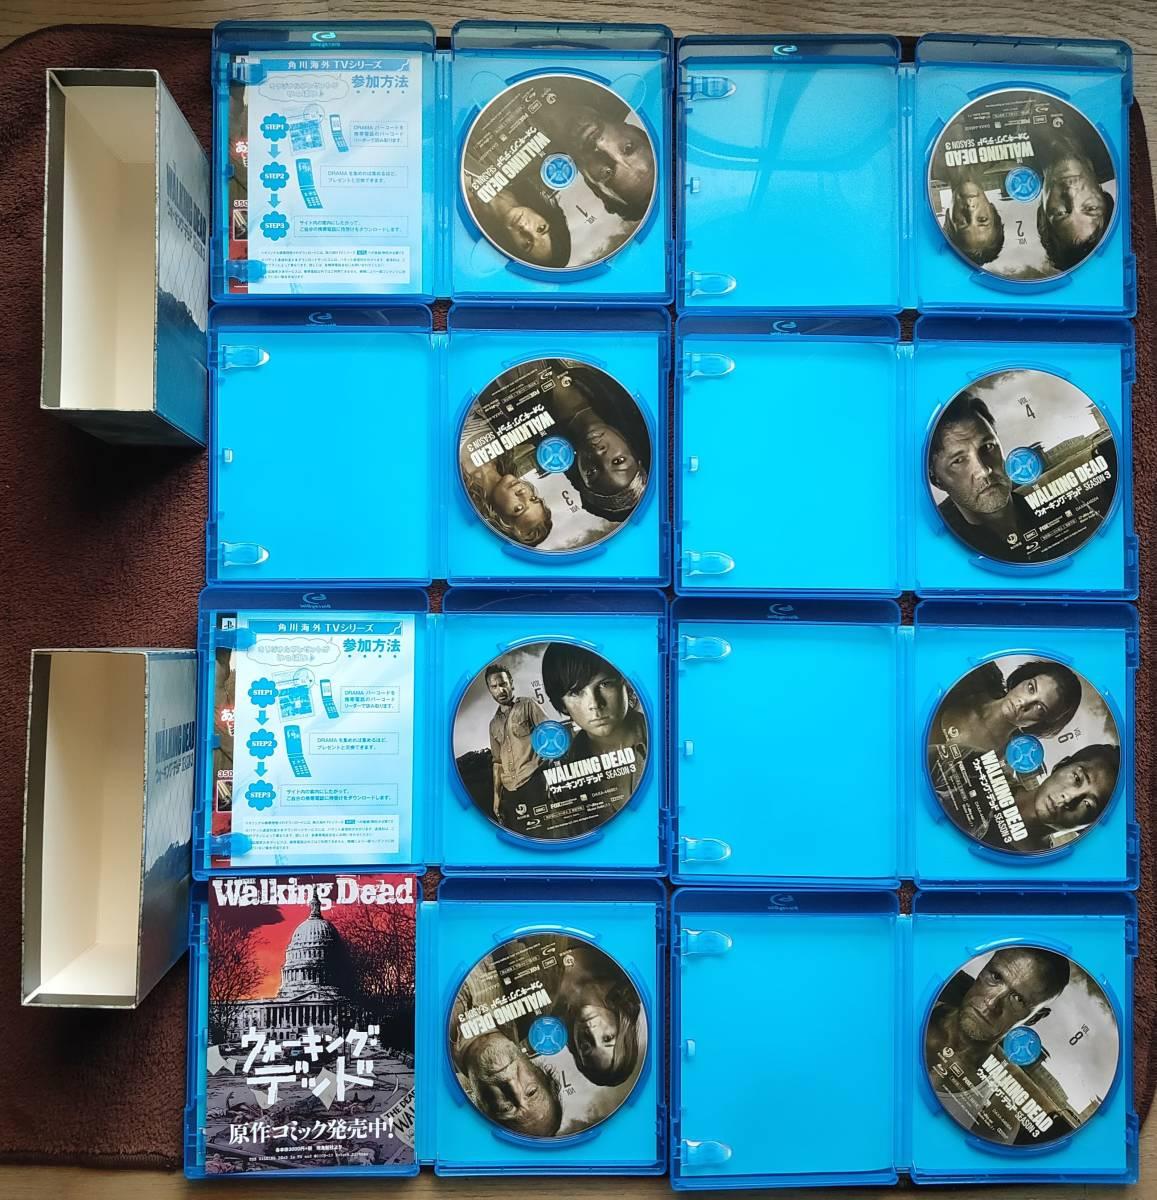 Blu-ray◆THE WALKING DEAD SEASON3 /ウォーキング・デッド シーズン3 Blu-ray BOX 1 & 2 ◆DAXA-4465&DAXA-4469◆送料込み